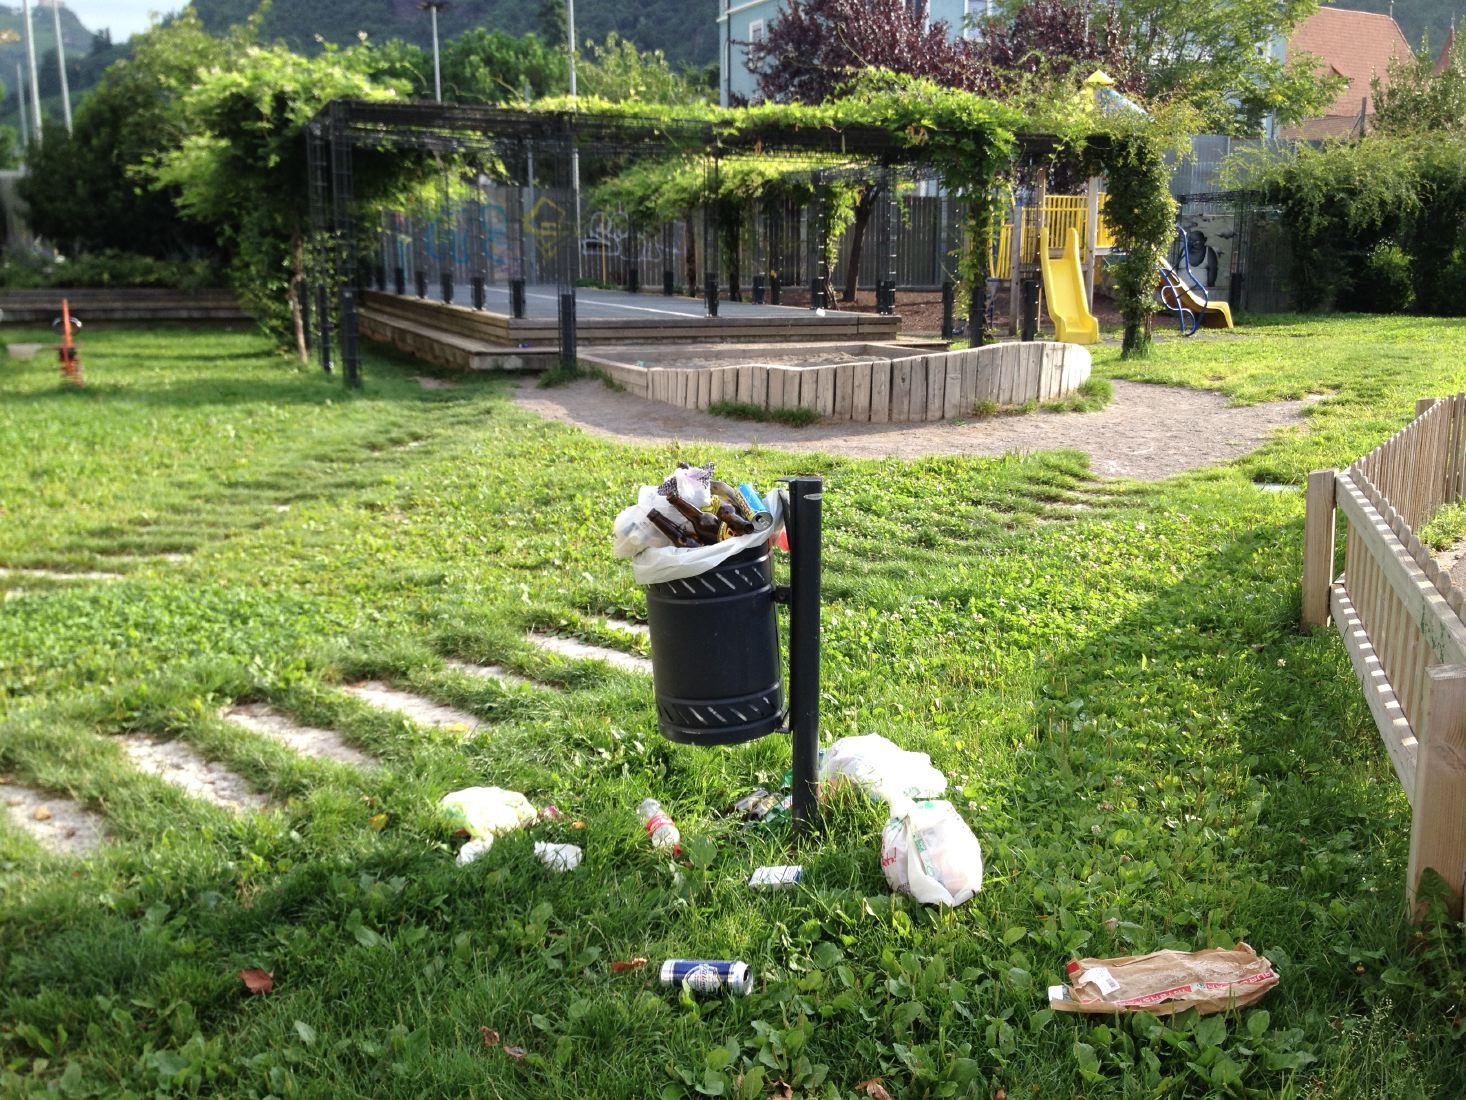 Il parco giochi tra via Vintola e via Weggenstein